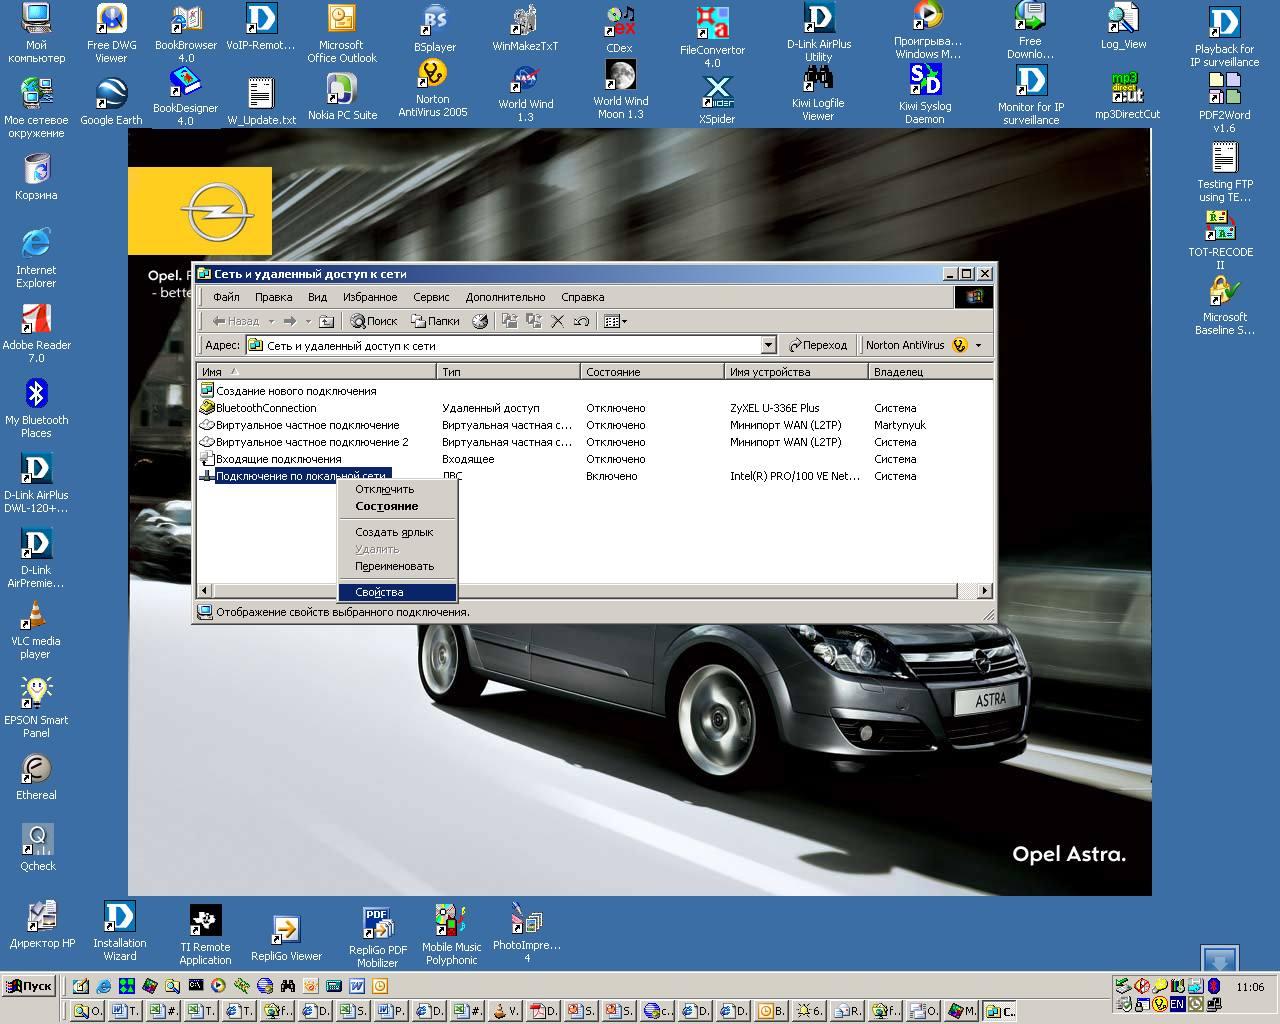 d link dsl 2640u firmware update download